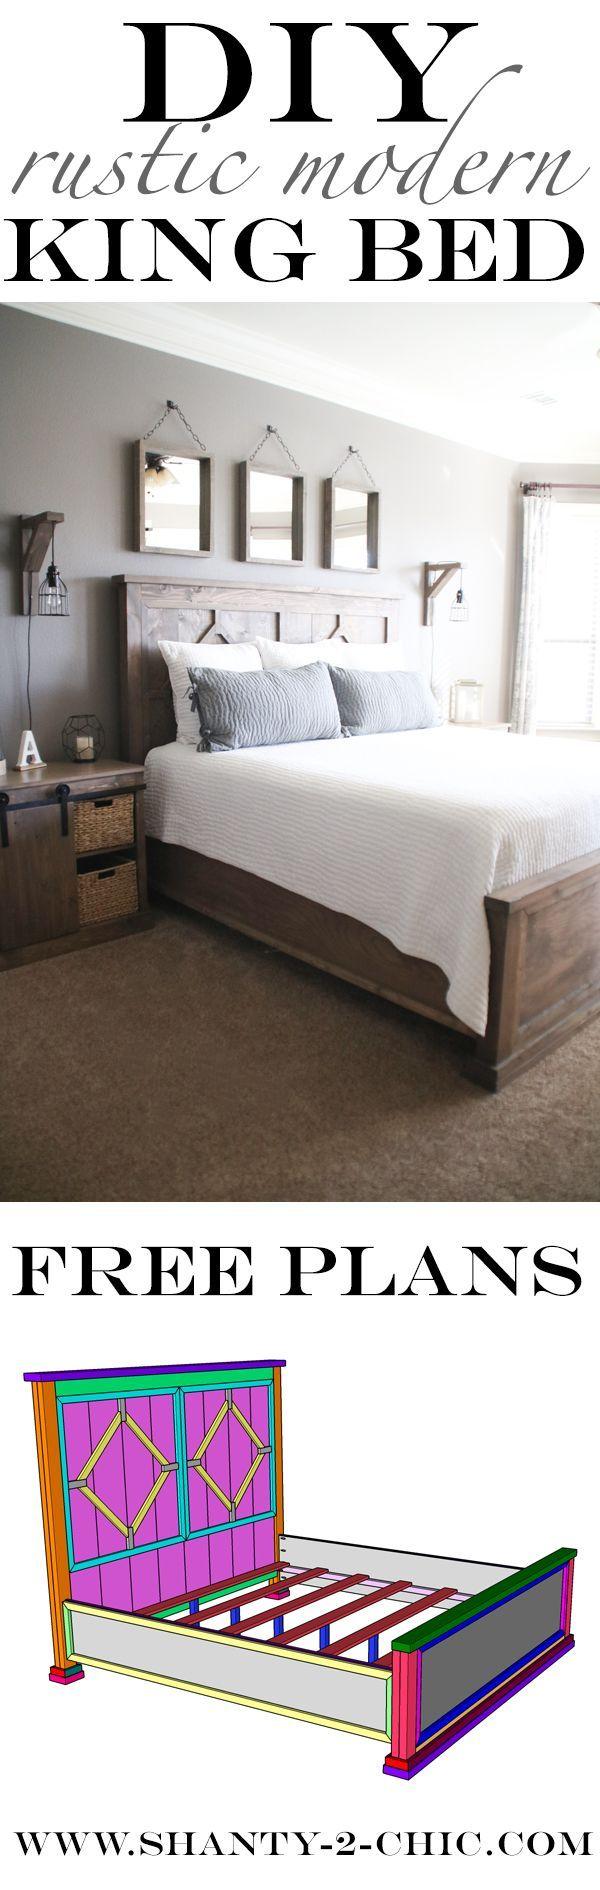 Baby jasper bed brackets - Diy Rustic Modern King Bed